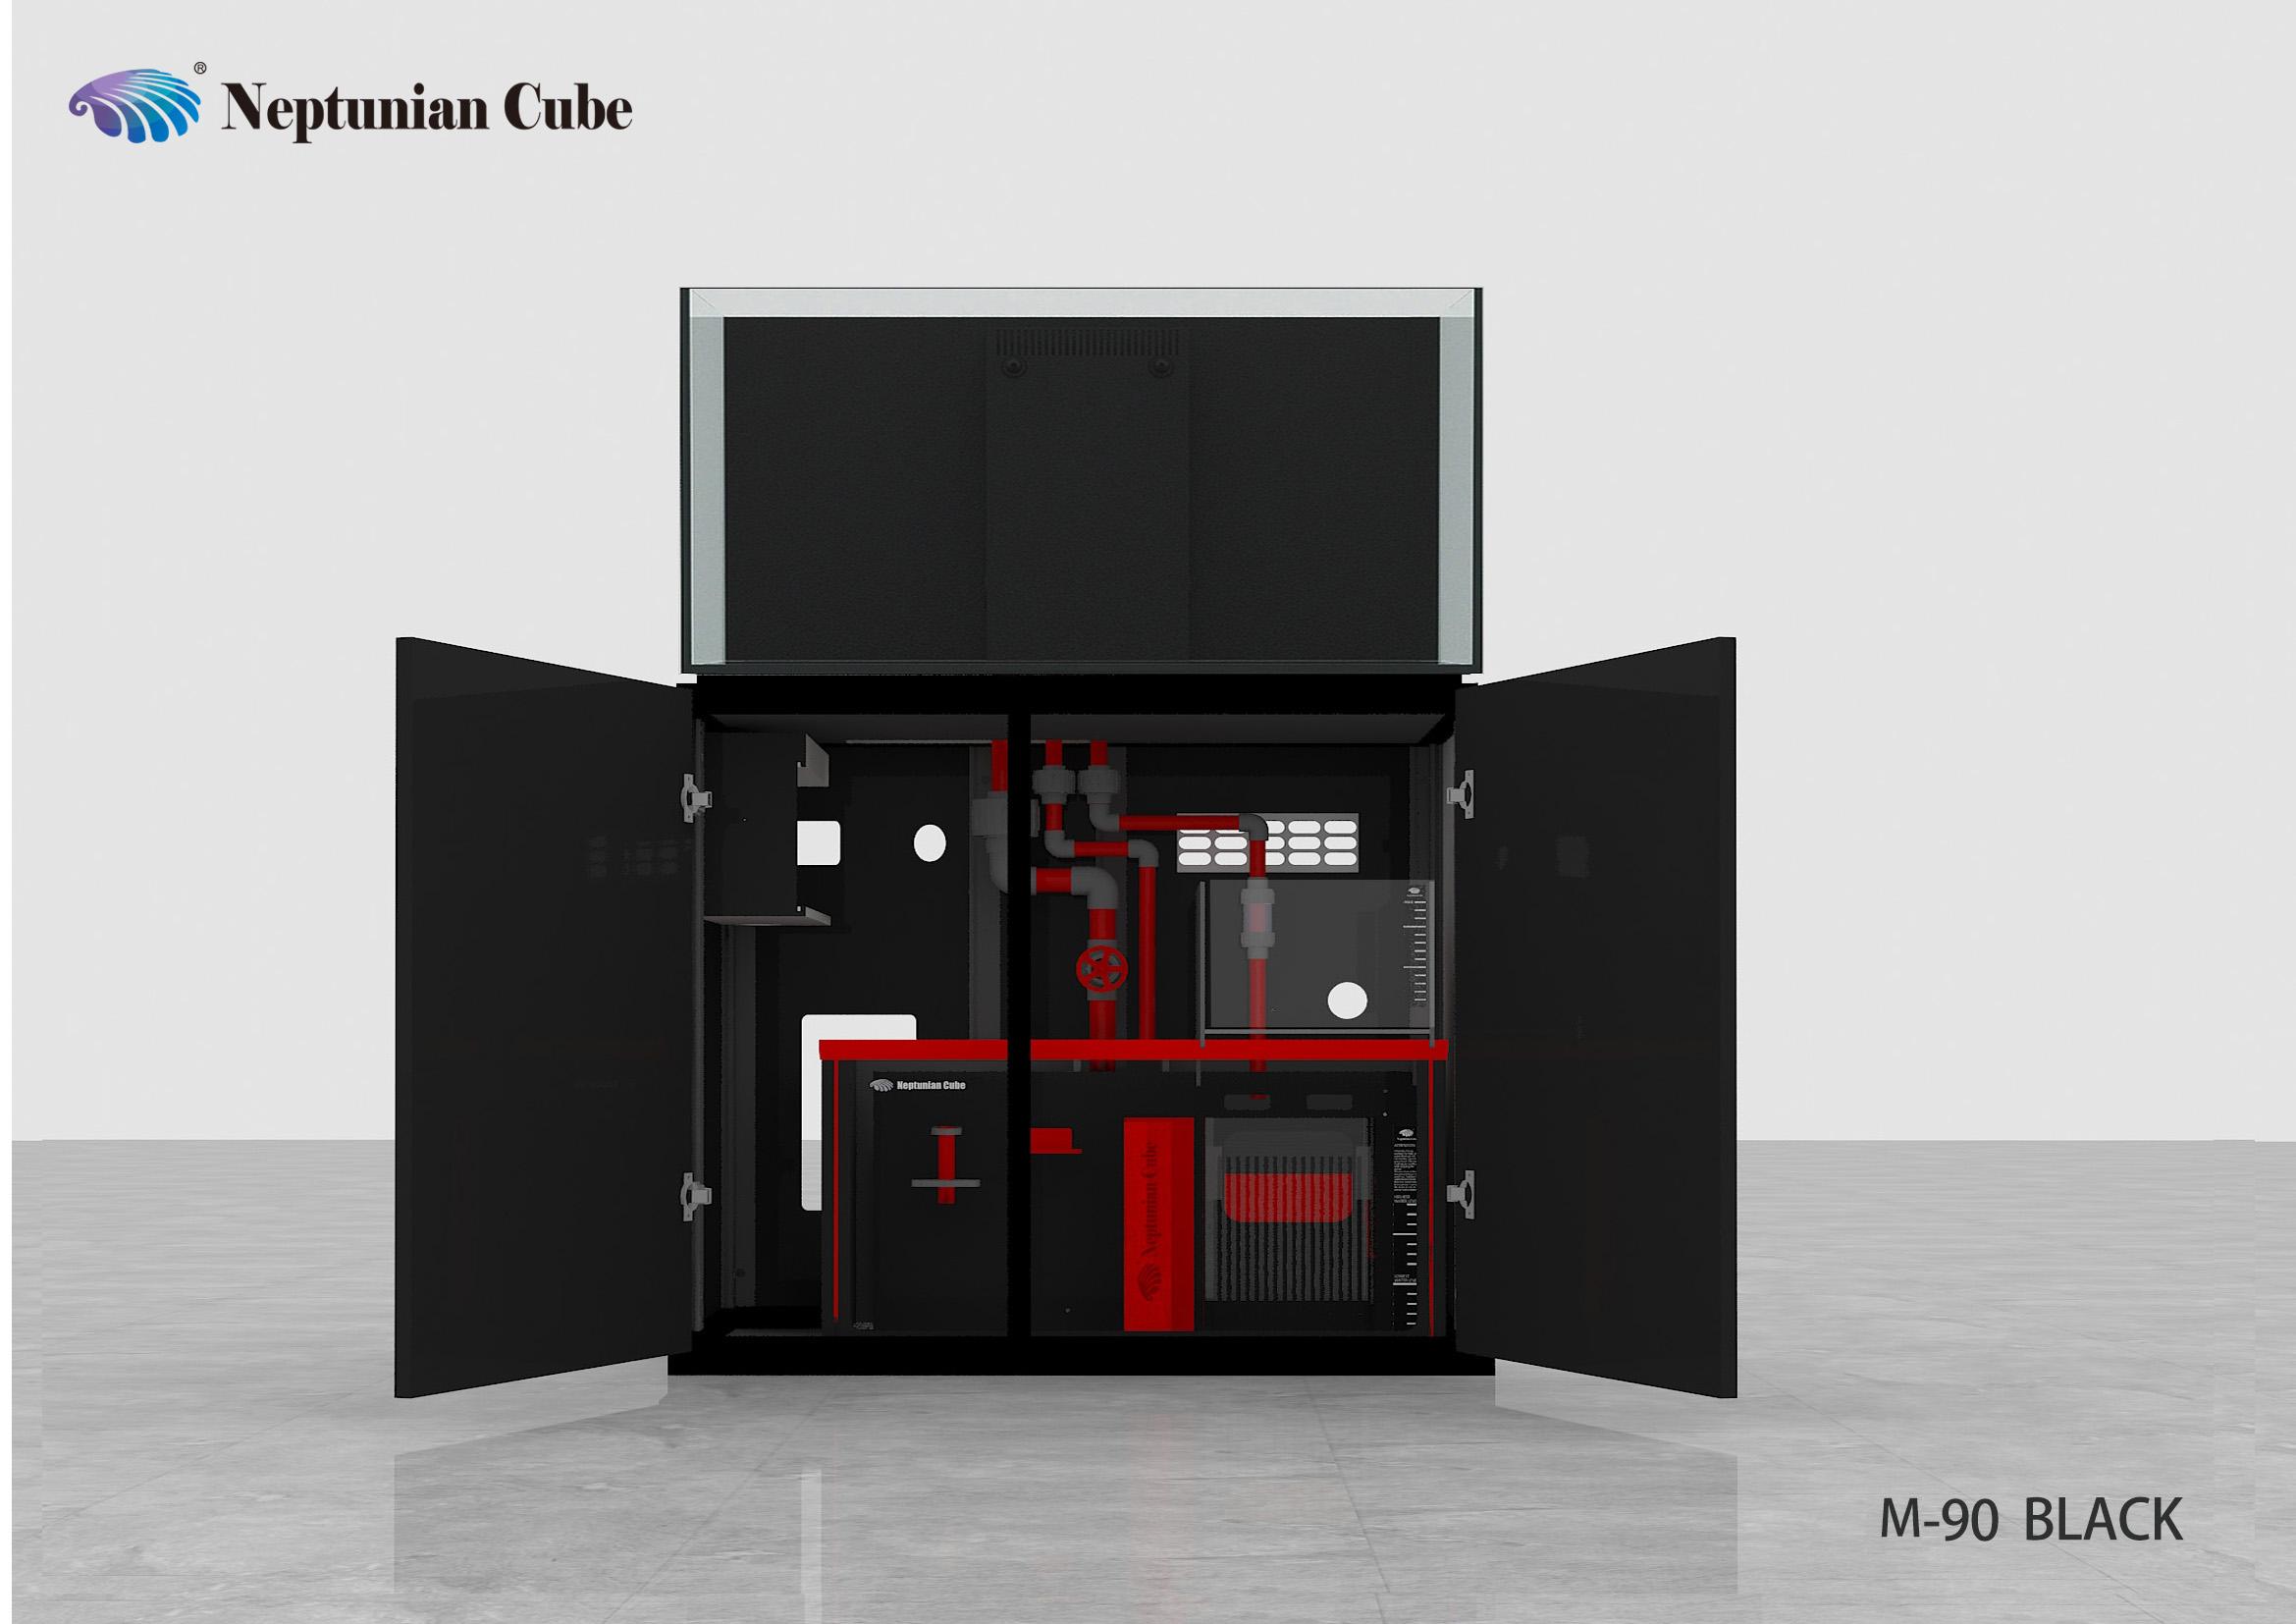 Neptunian Cube Aquarium Serie M90 schwarz Palettenversand